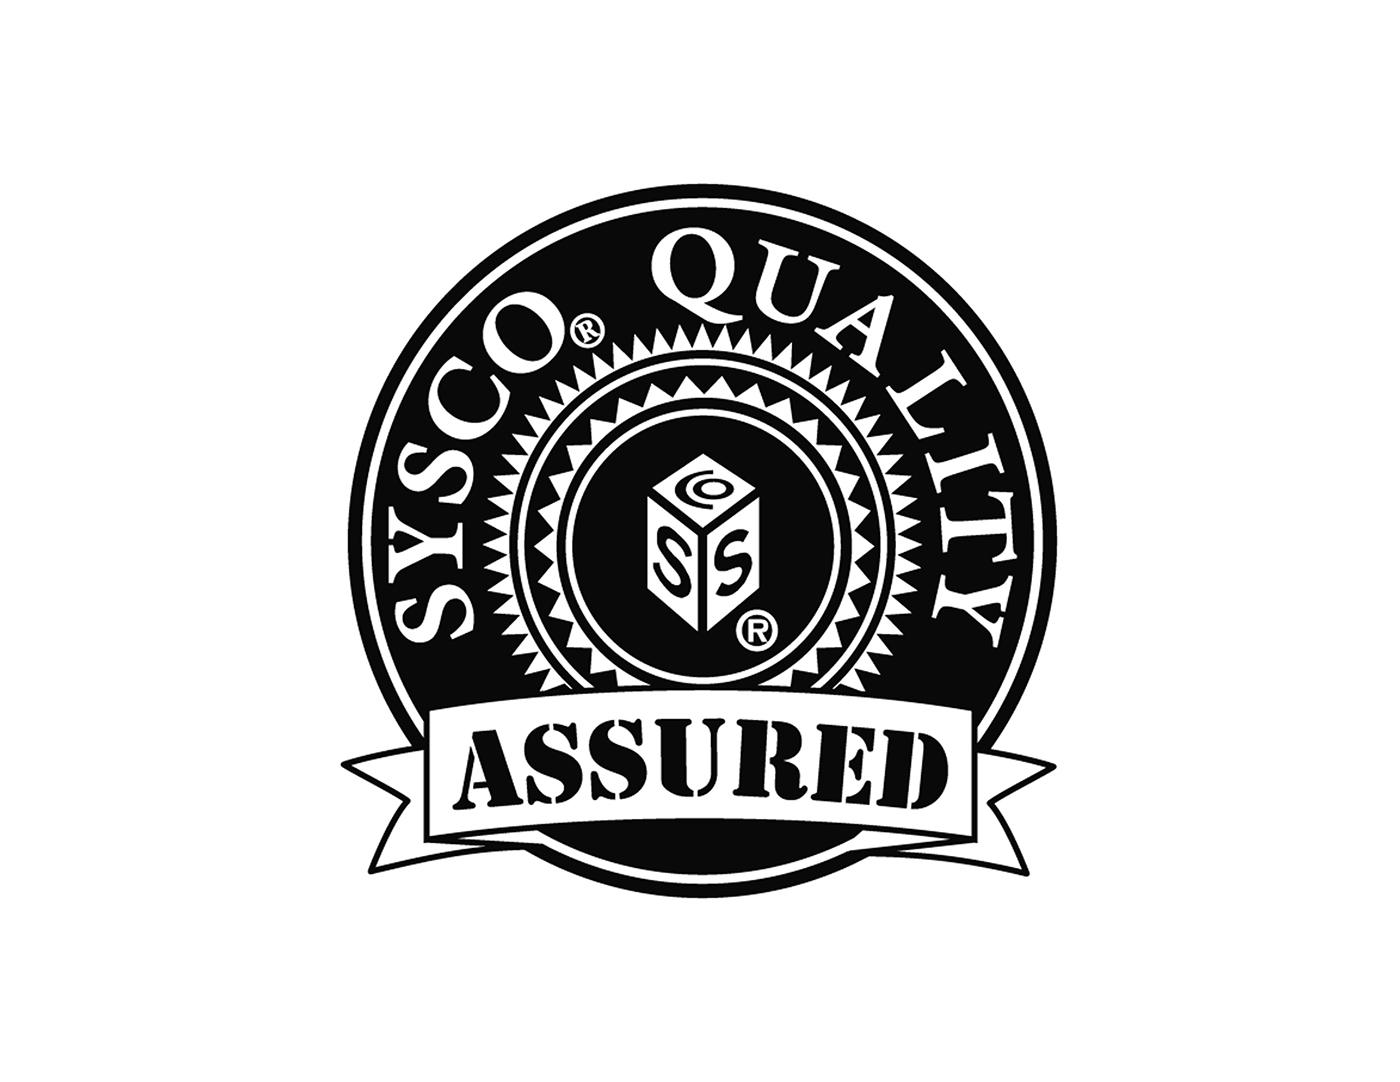 Quality Assurance Brand Design on Behance  Quality Assuran...